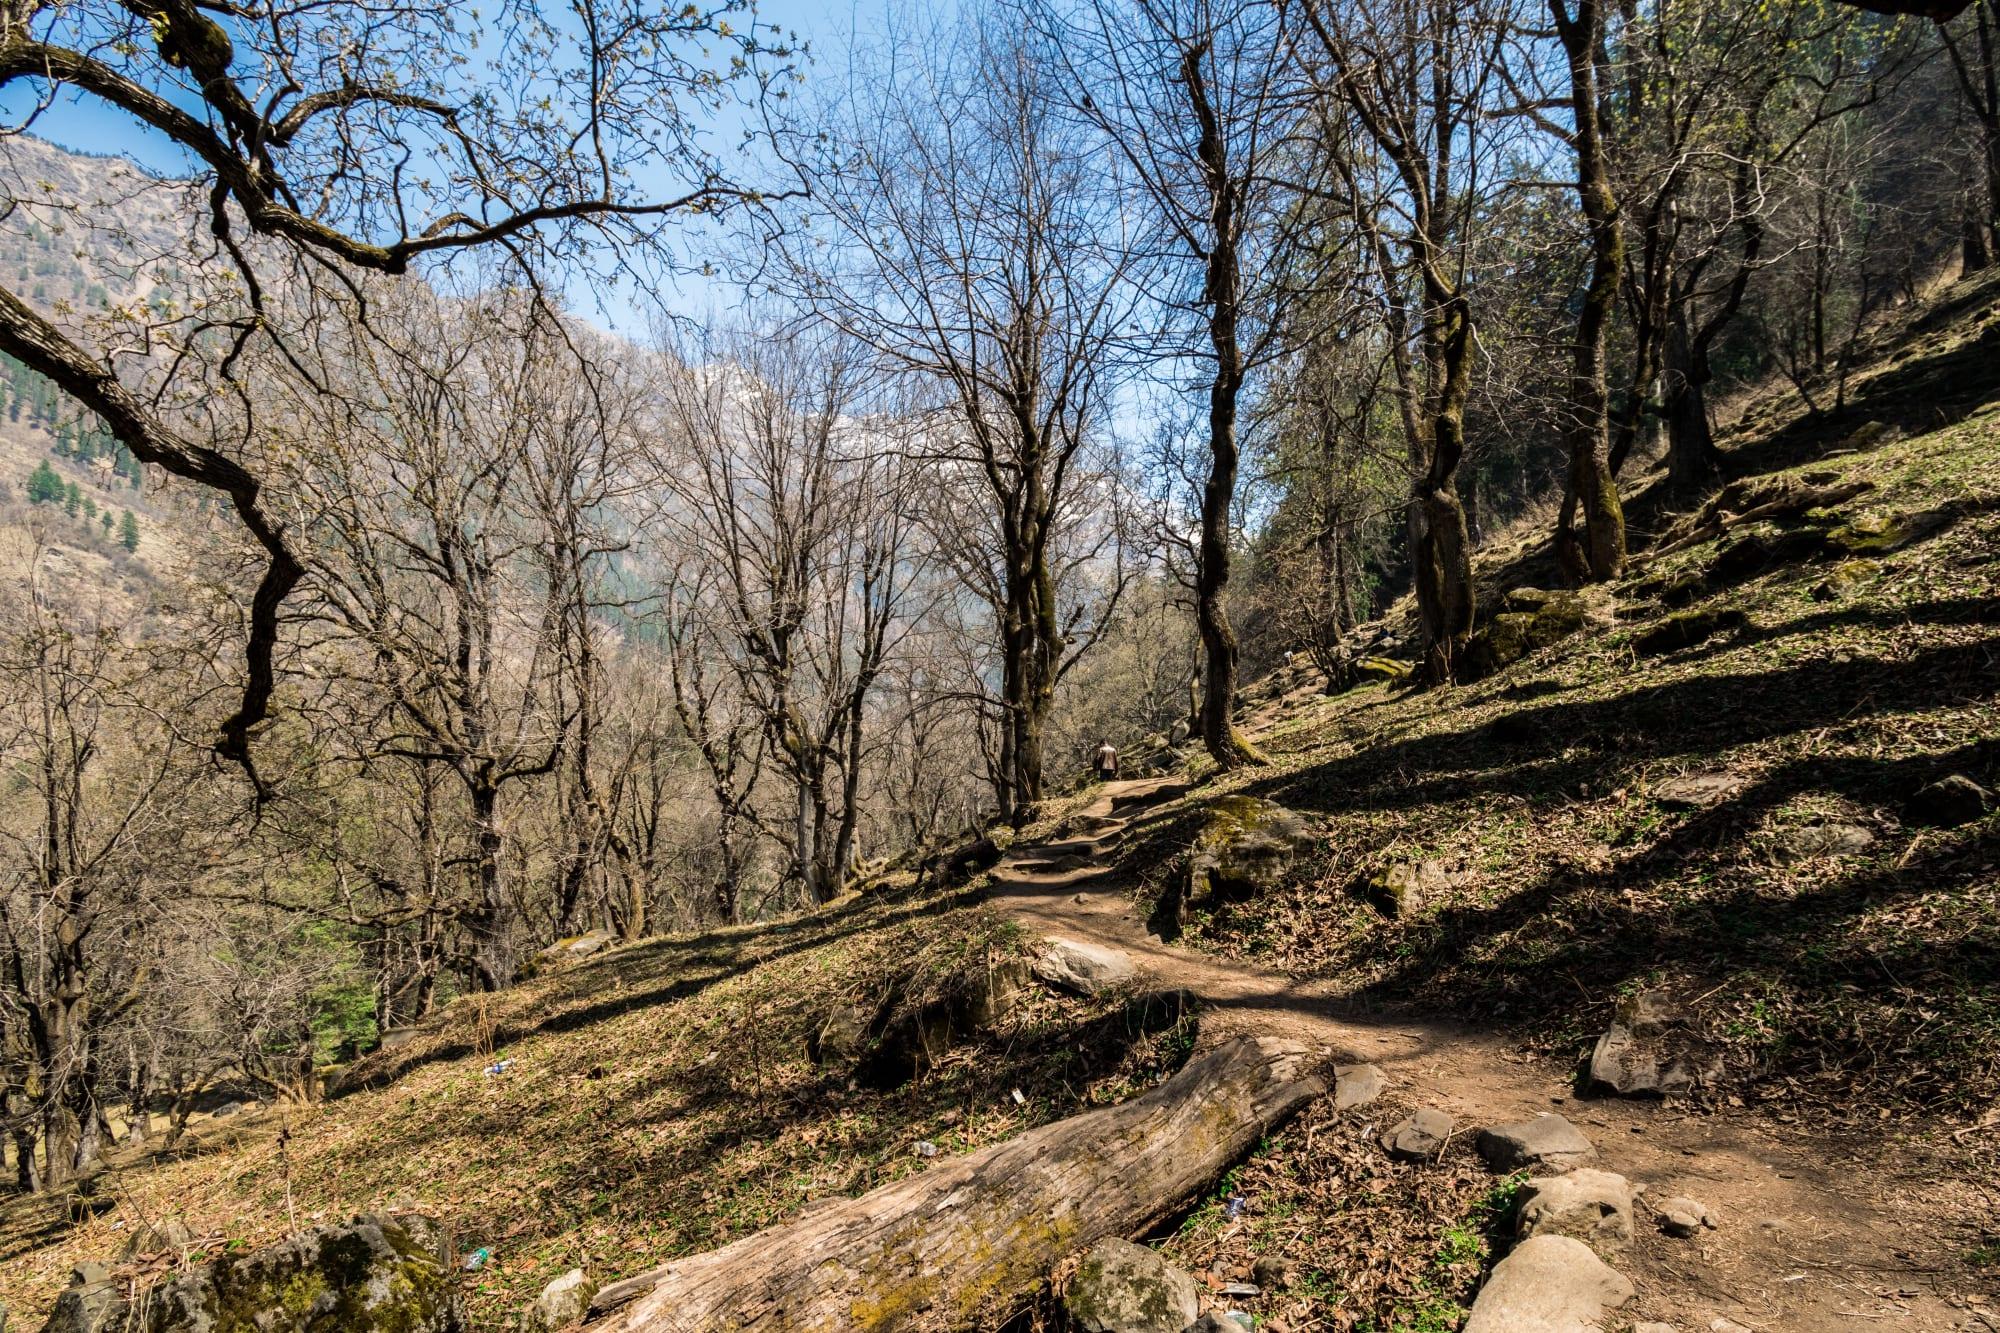 Mesmerizing view throughout the trek to Kheerganga